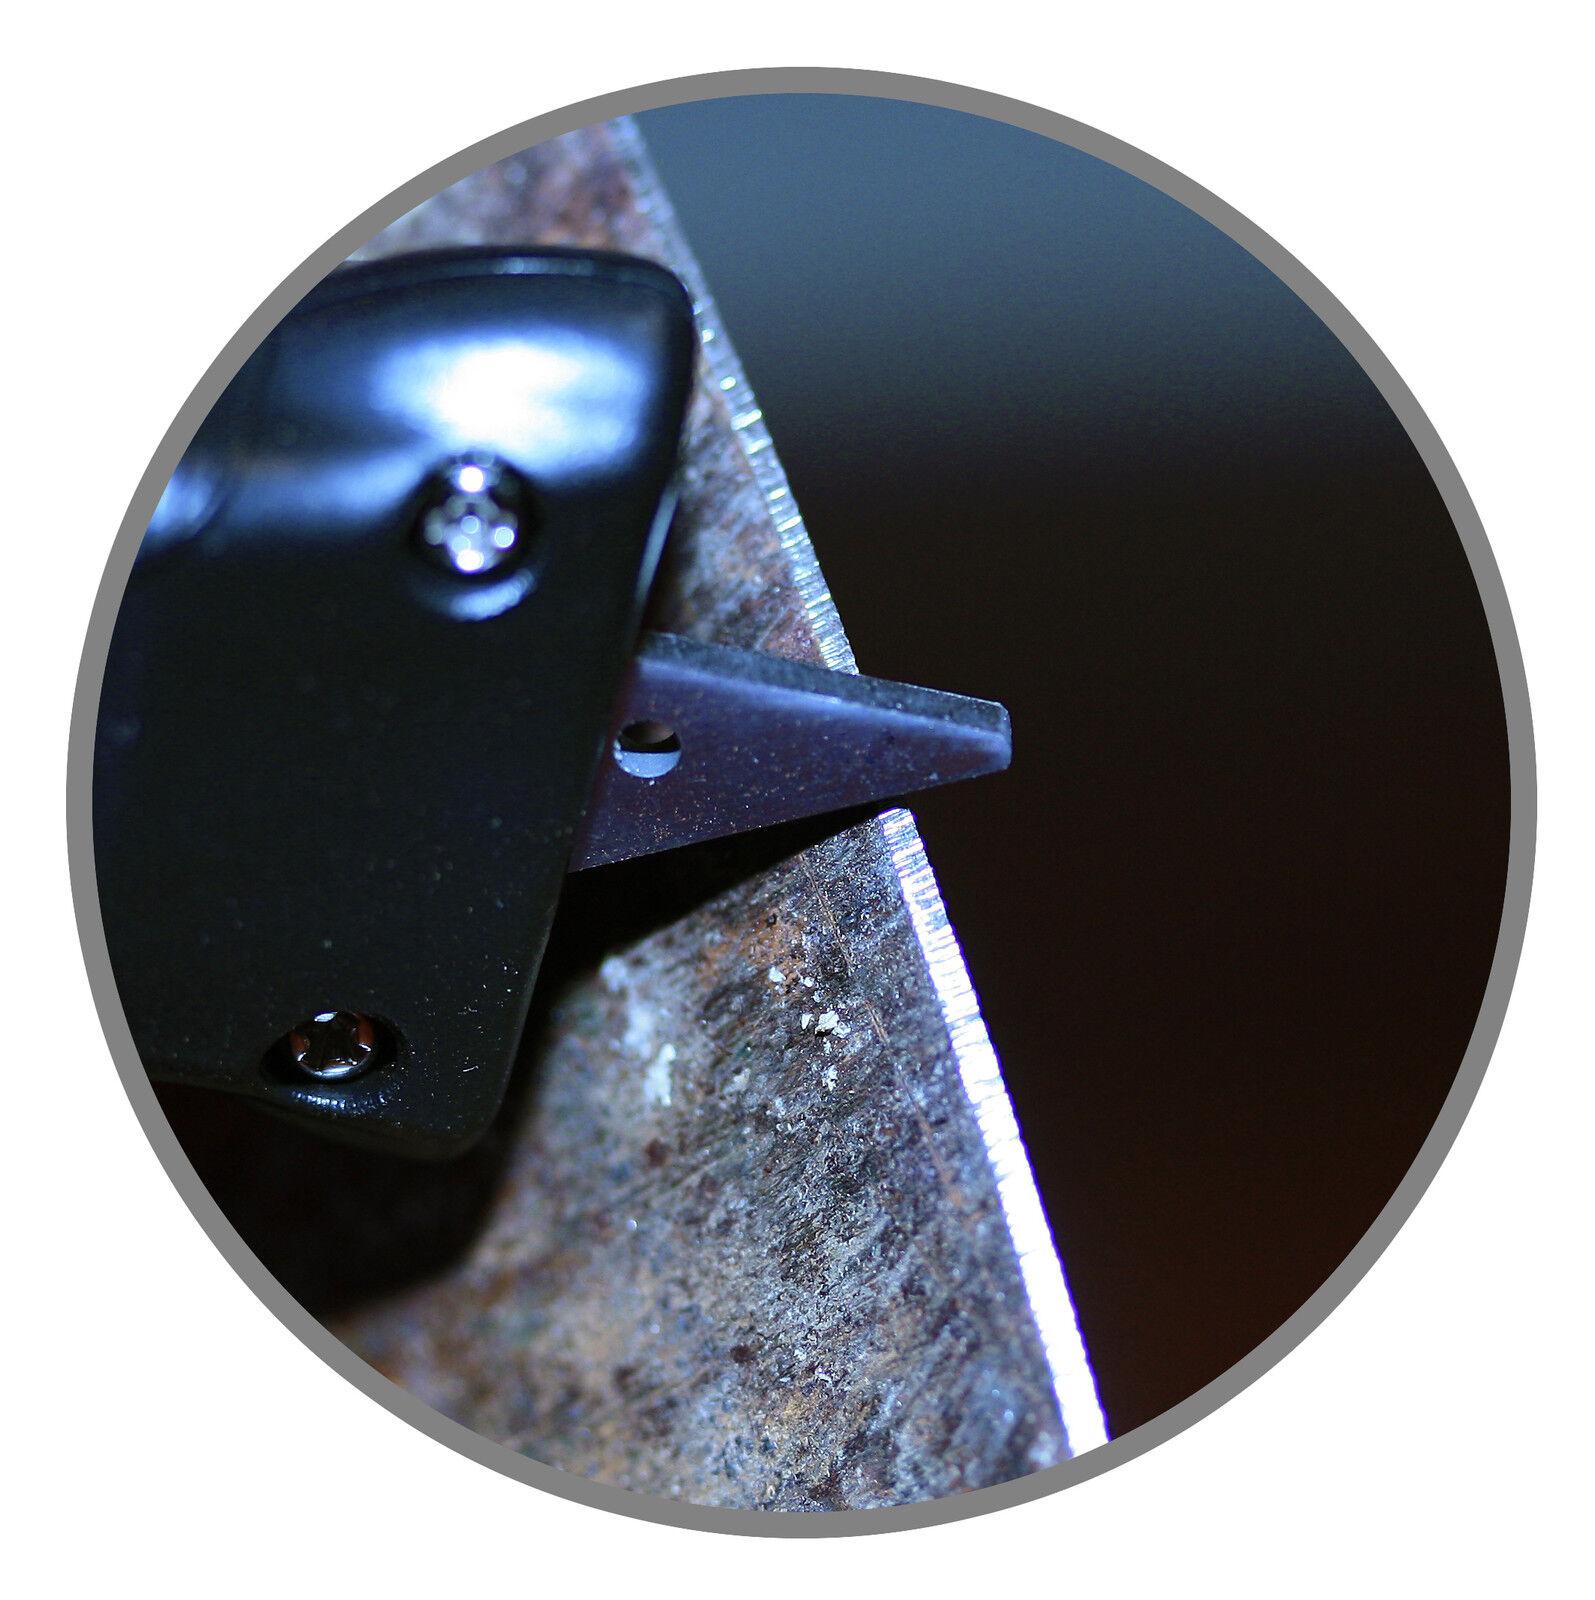 Turbo Schärfer  DAS ORIGINAL *NEU*  Messerschärfer -Schleifgerät -Schärfgerät